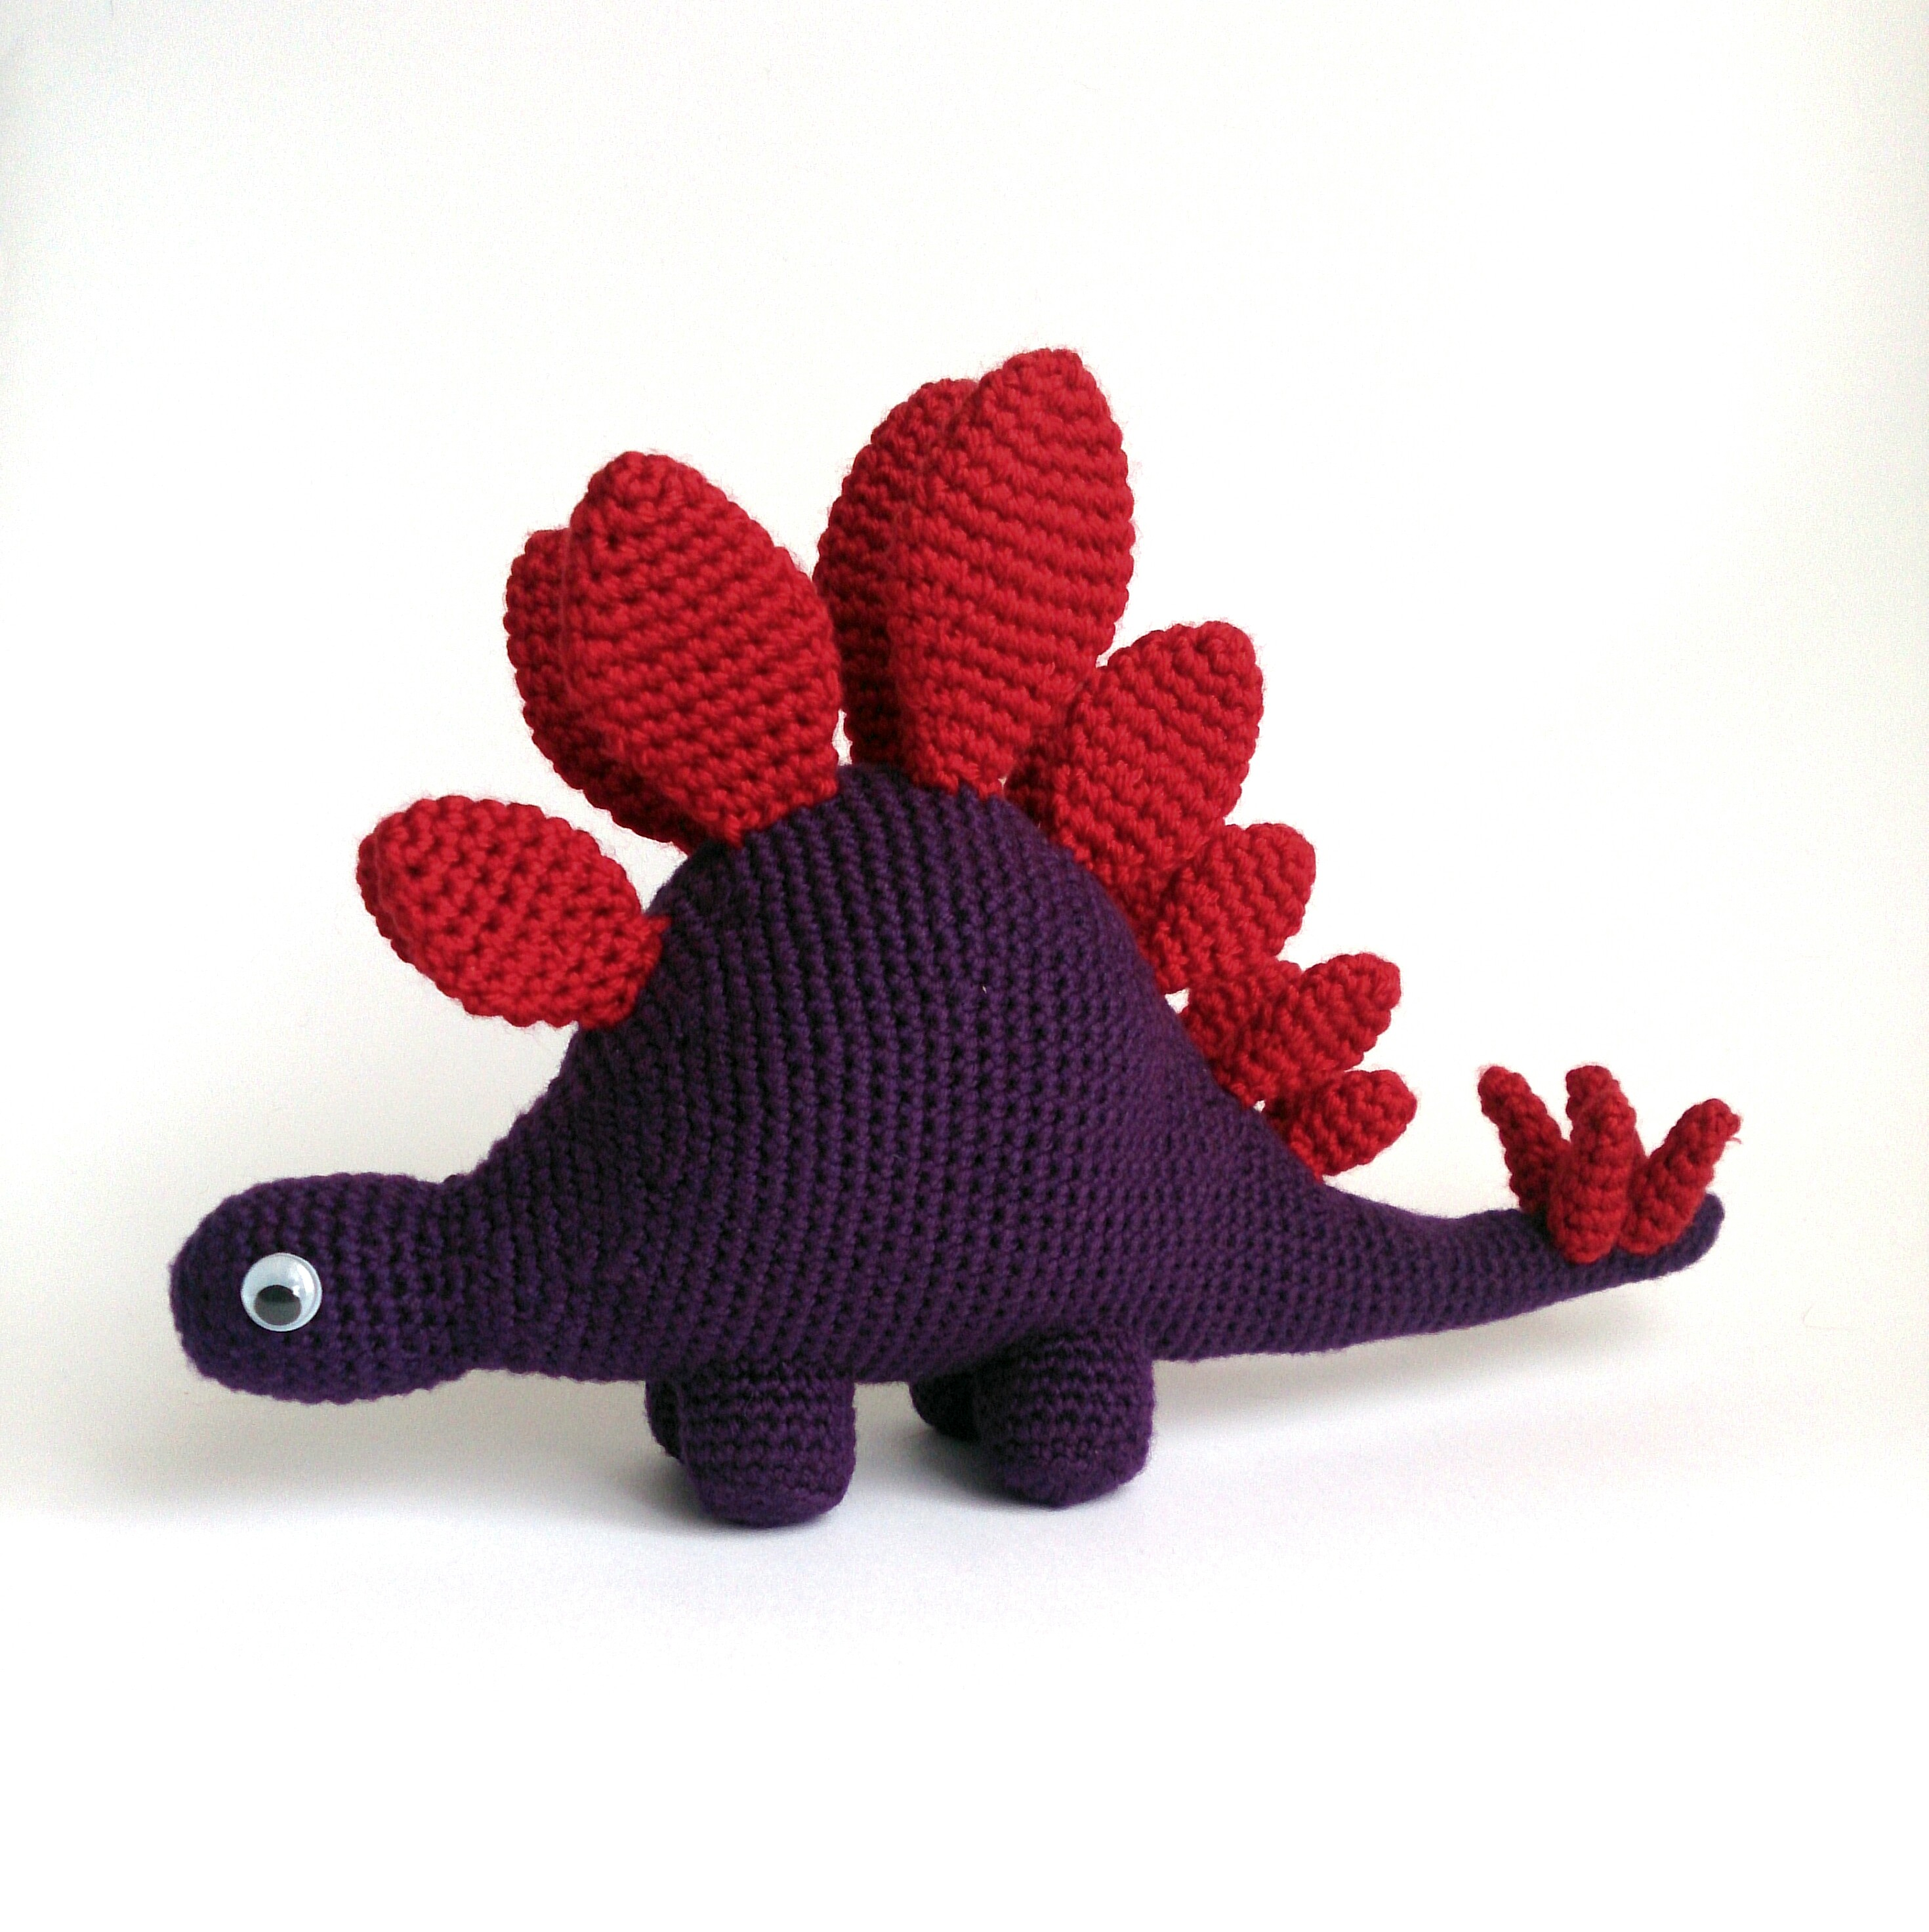 Stegosaurus amigurumi crochet pattern by The Button Ship